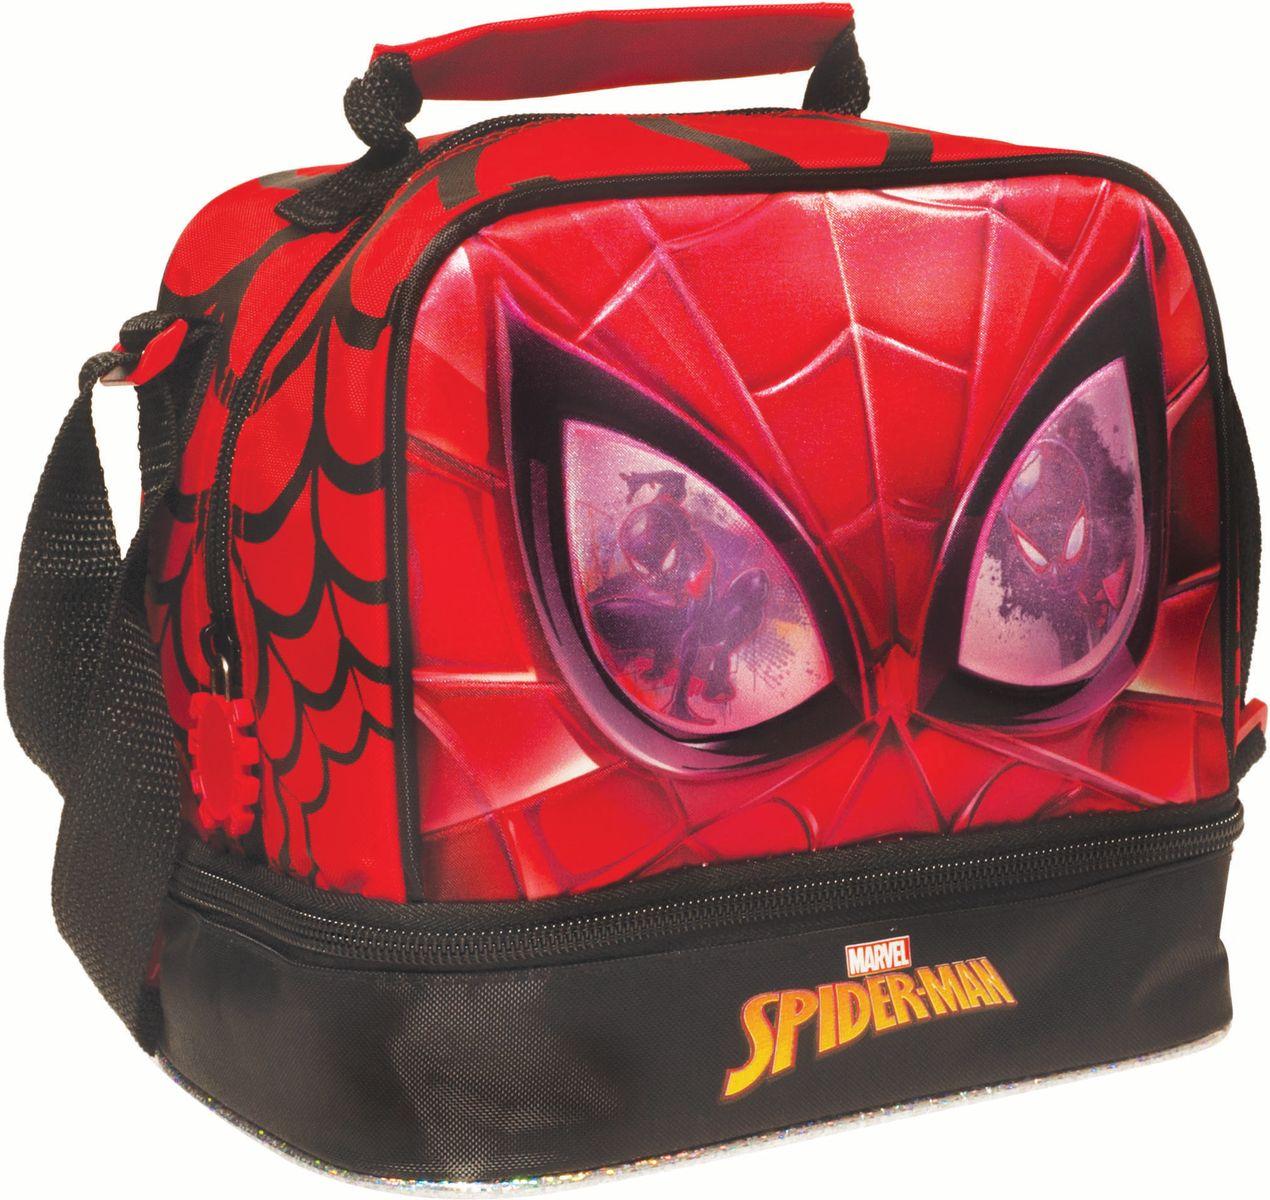 9be91223b4 Τσαντάκι Φαγητού Spiderman Face Gim 337-73220